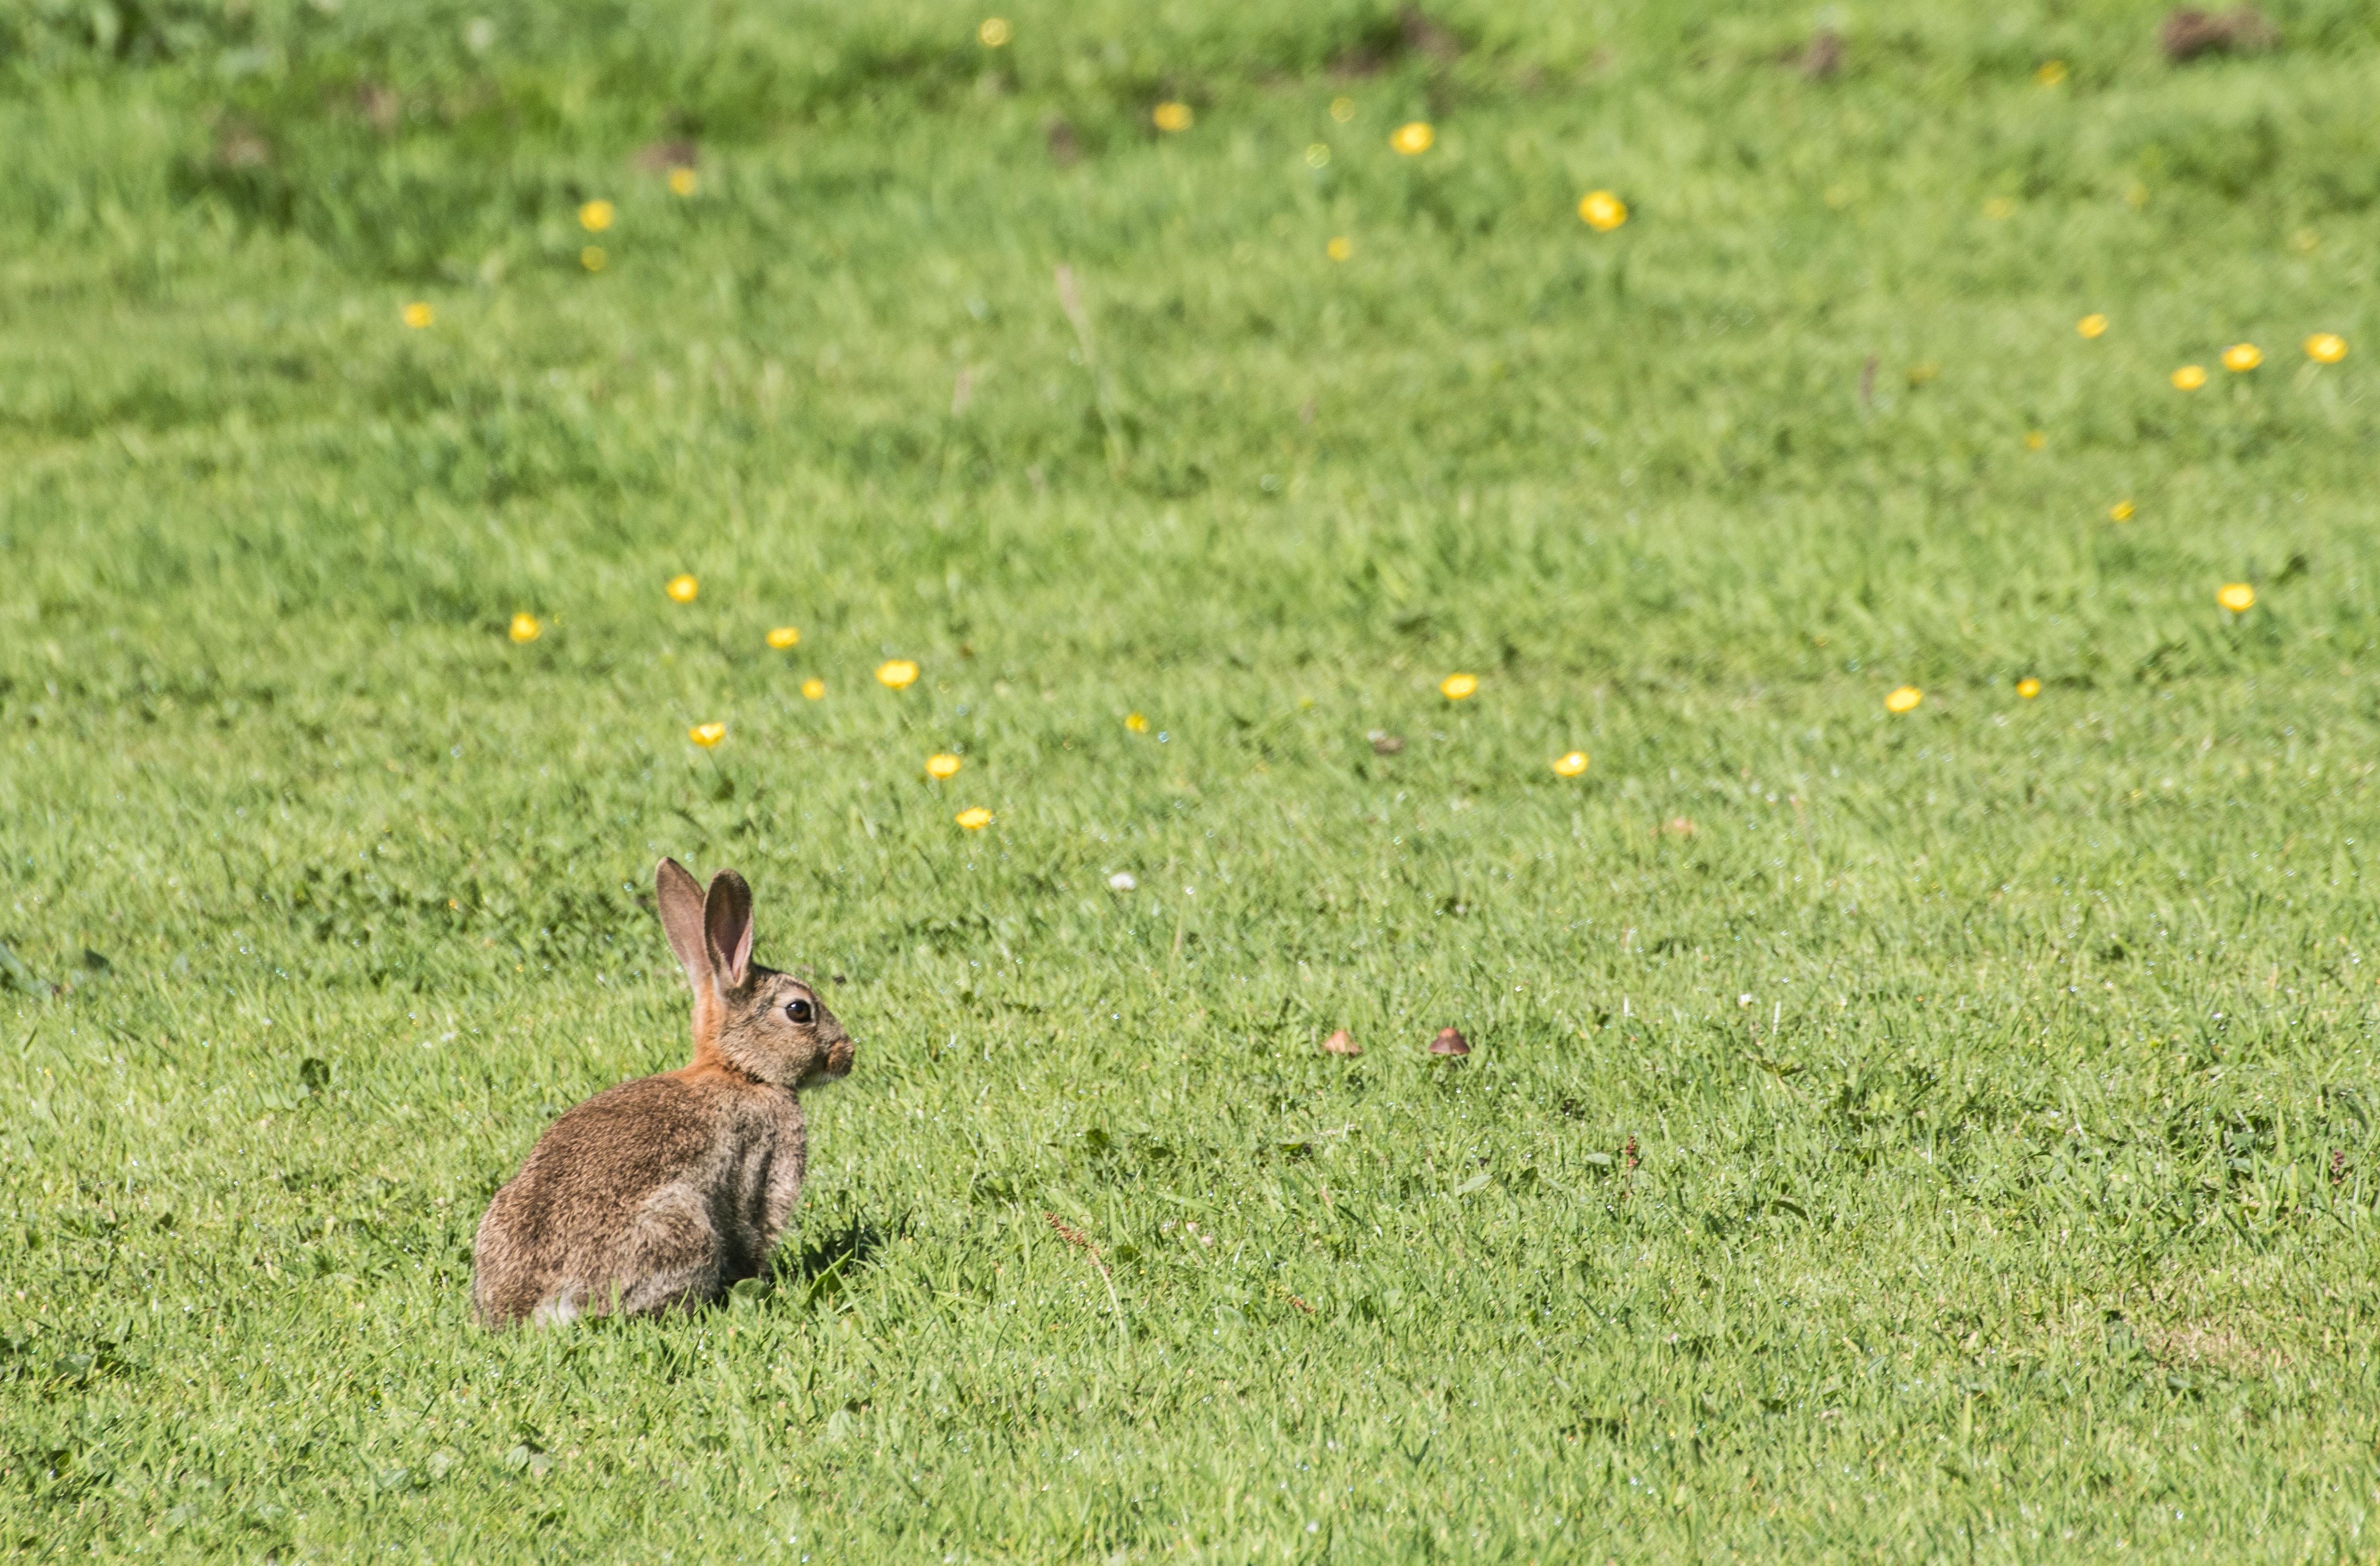 photo of rabbit on grass